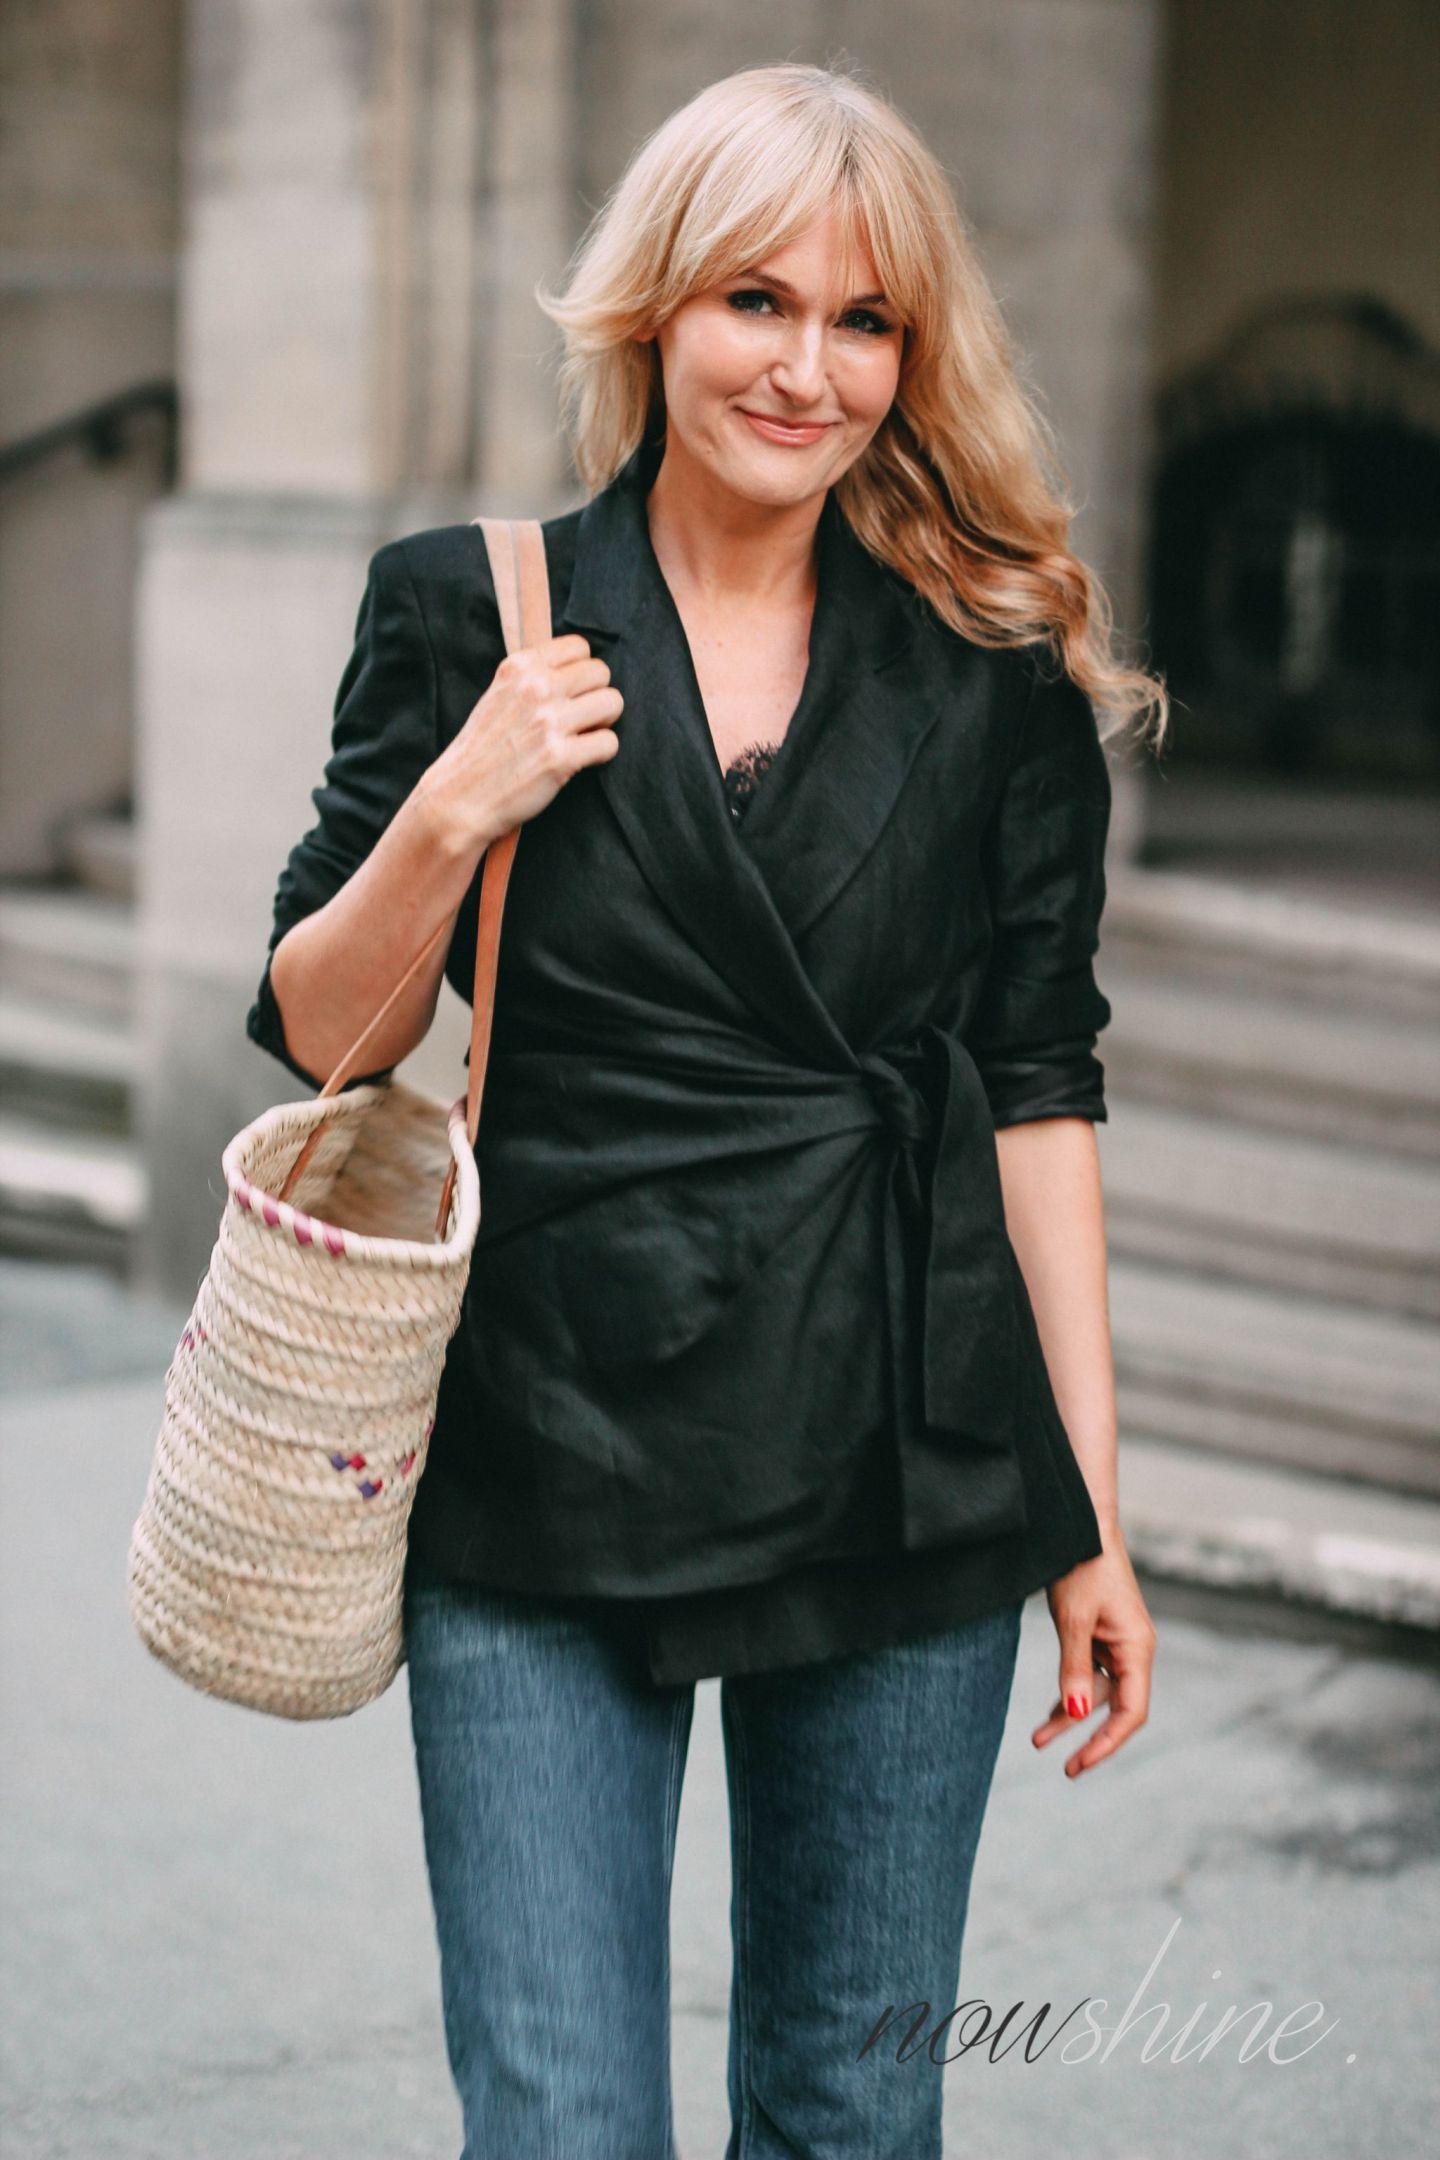 Klassiker schwarzer Leinenblazer Zara - Trend 2018 - Nowshine Fashion ü40